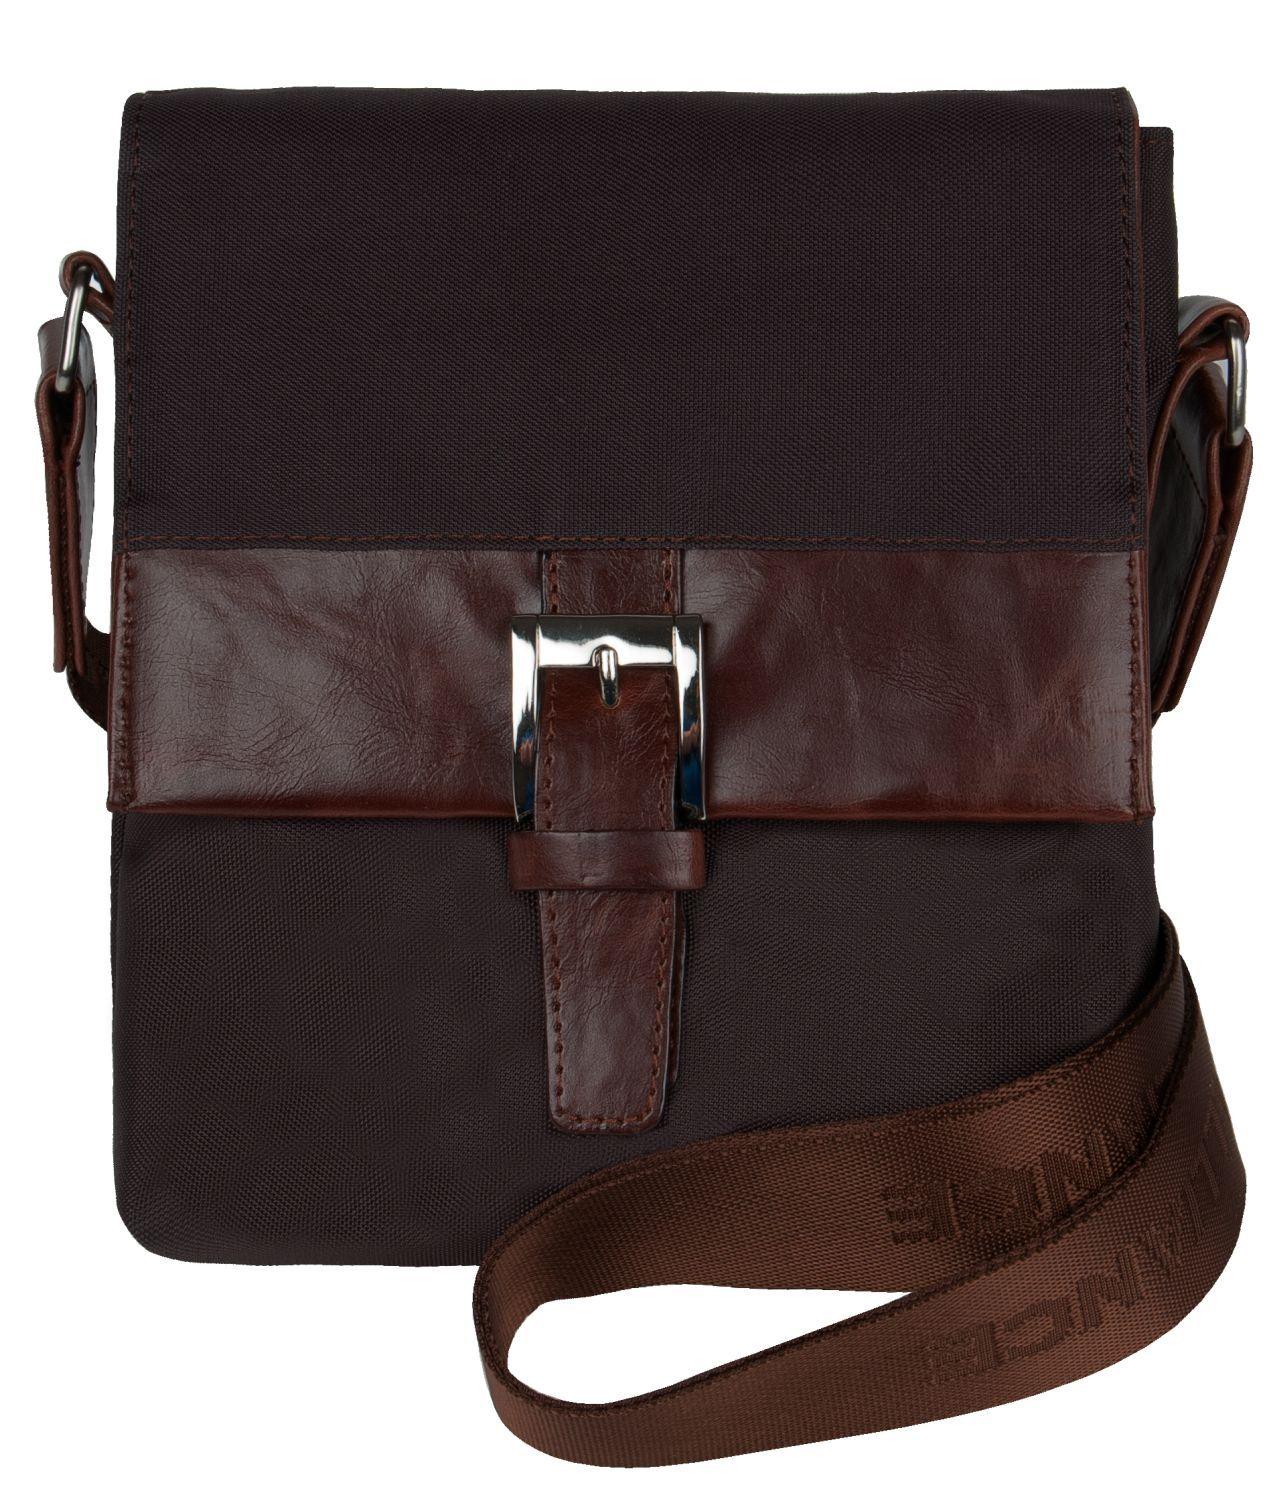 be5e4d3b28f8 Мужская сумка из текстиля - Купить мужскую сумку из текстиля